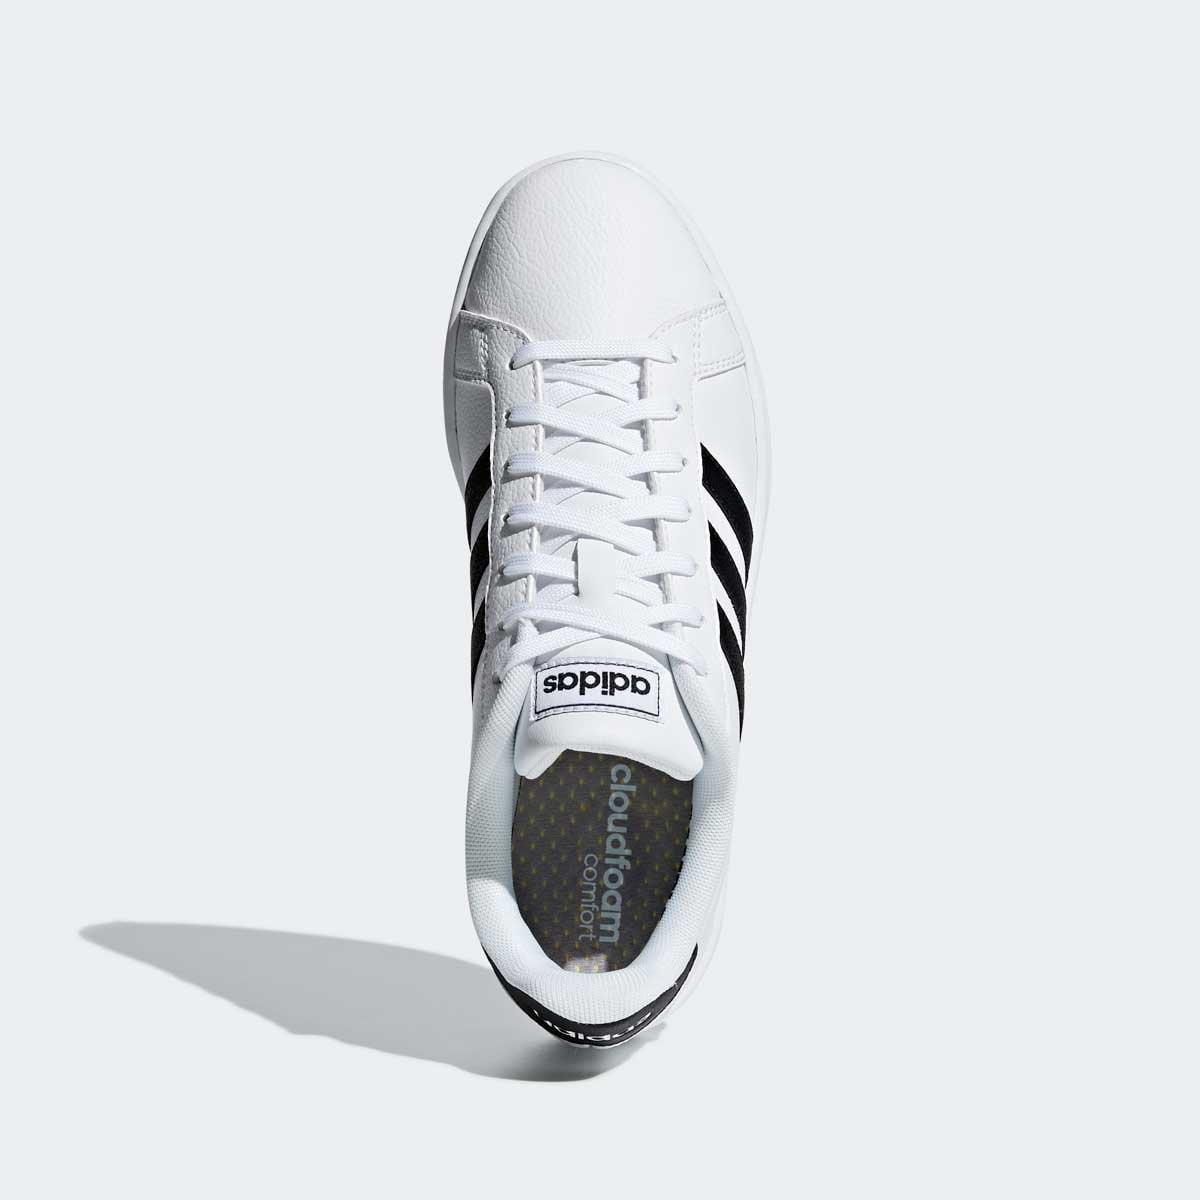 Tenis Casual Grand Court Blanco Adidas - Dama